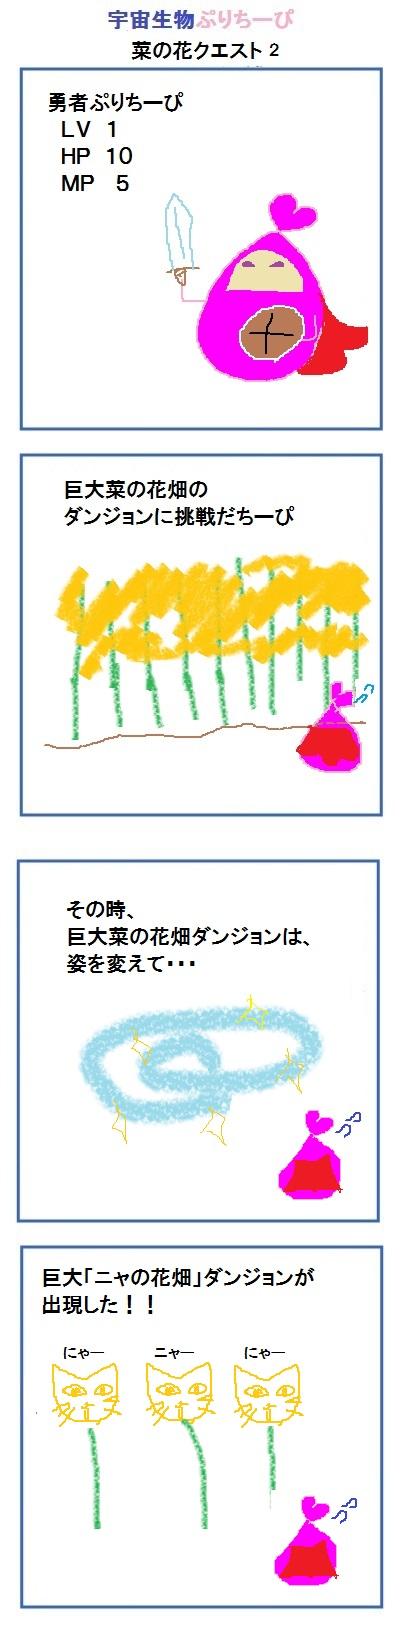 160315_nanohana_quest2.jpg